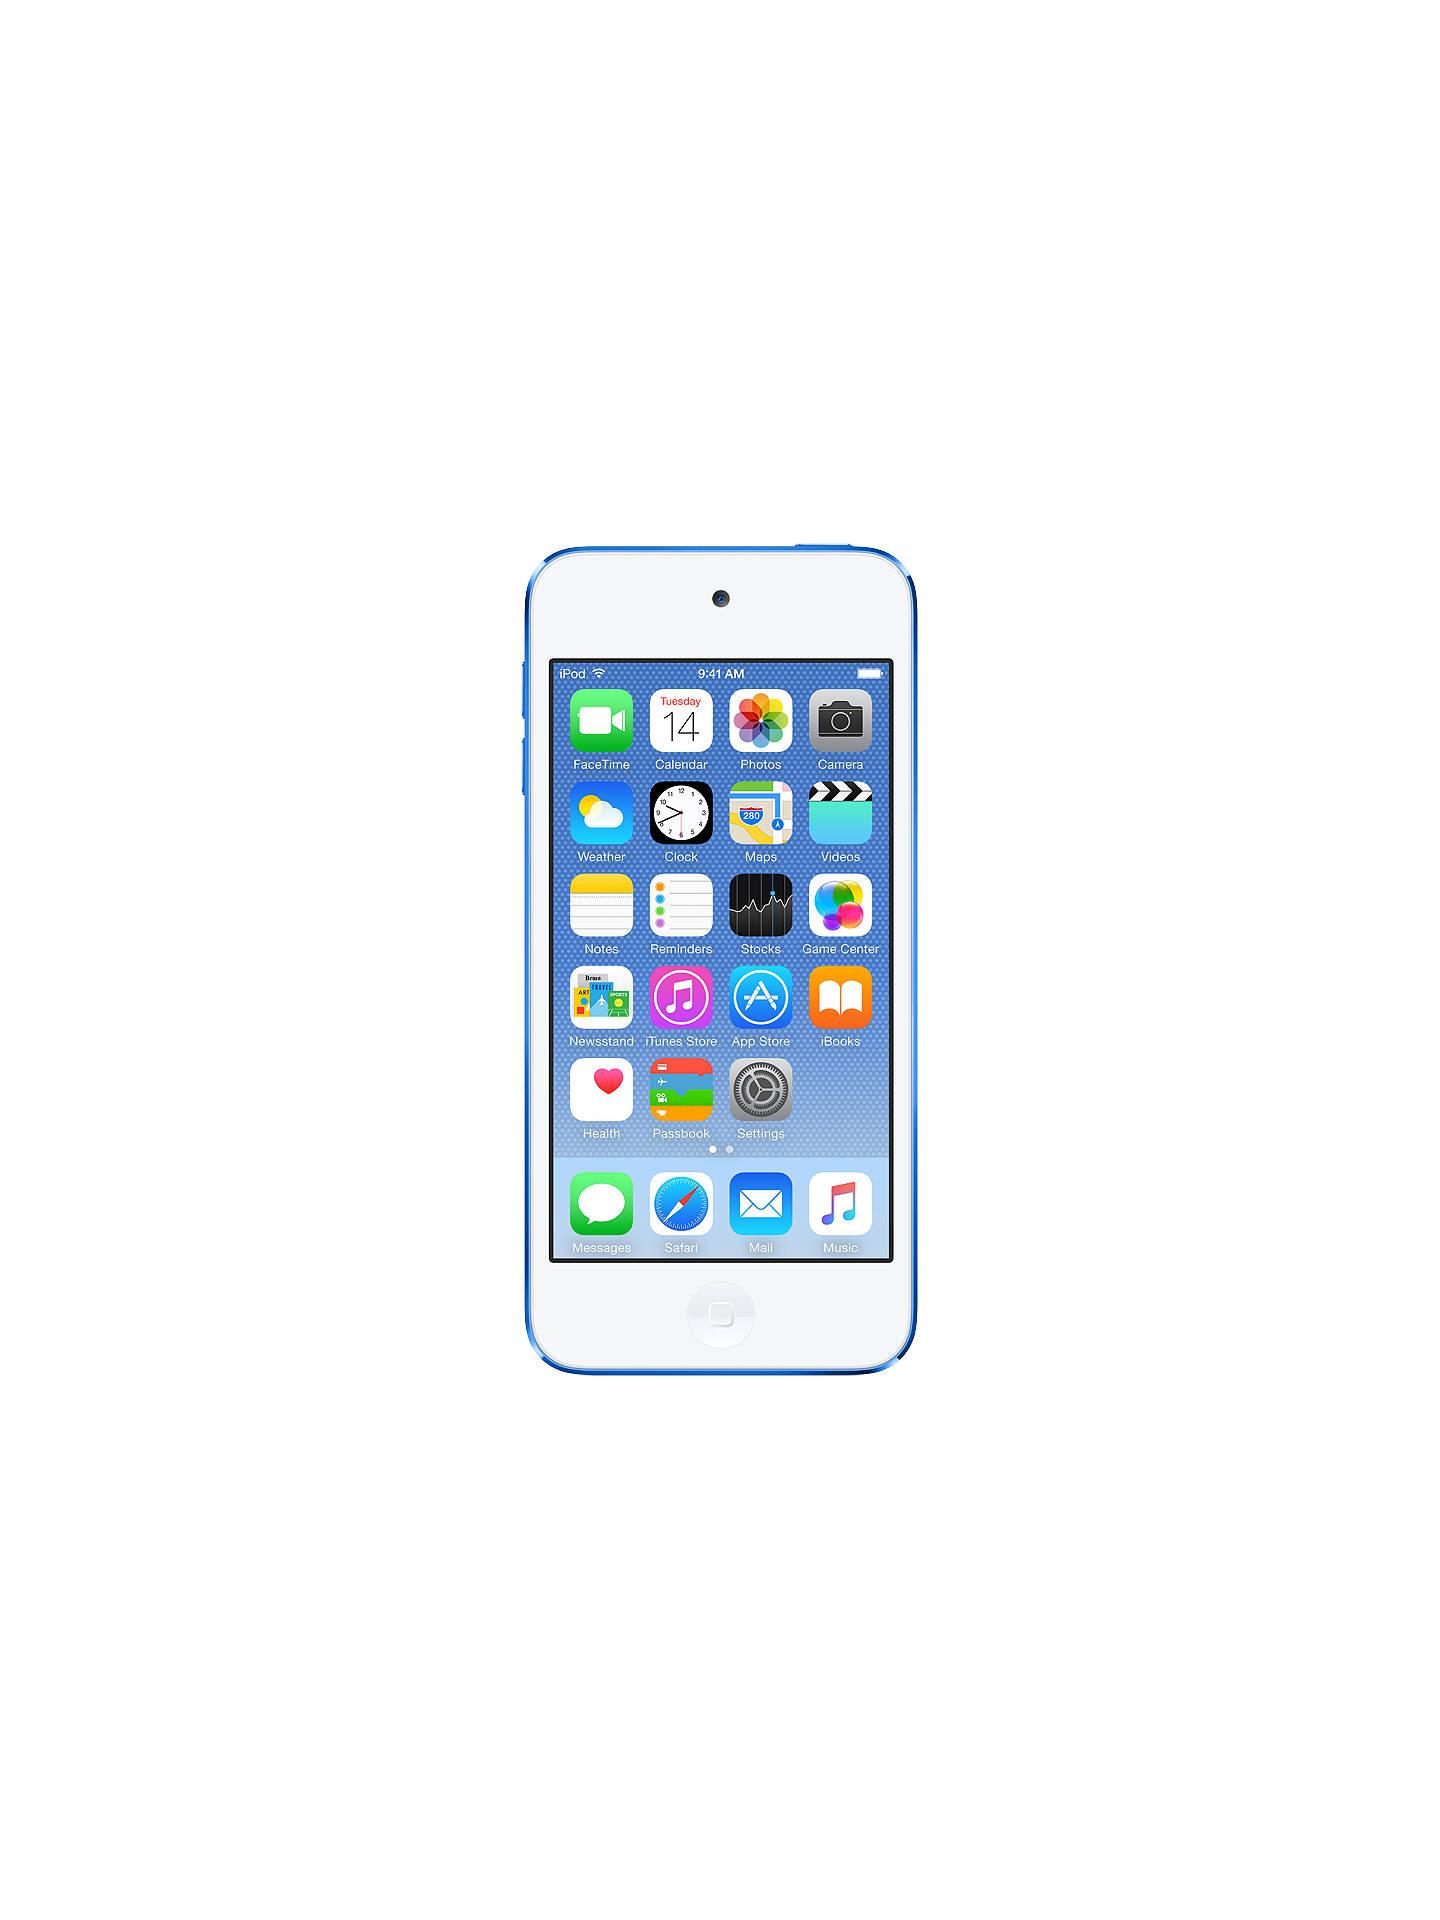 BIB PINK//BLUE IPAD,IPOD,IPHONE MAC APPLE NEW PARENT BABY SHOWER GIFT